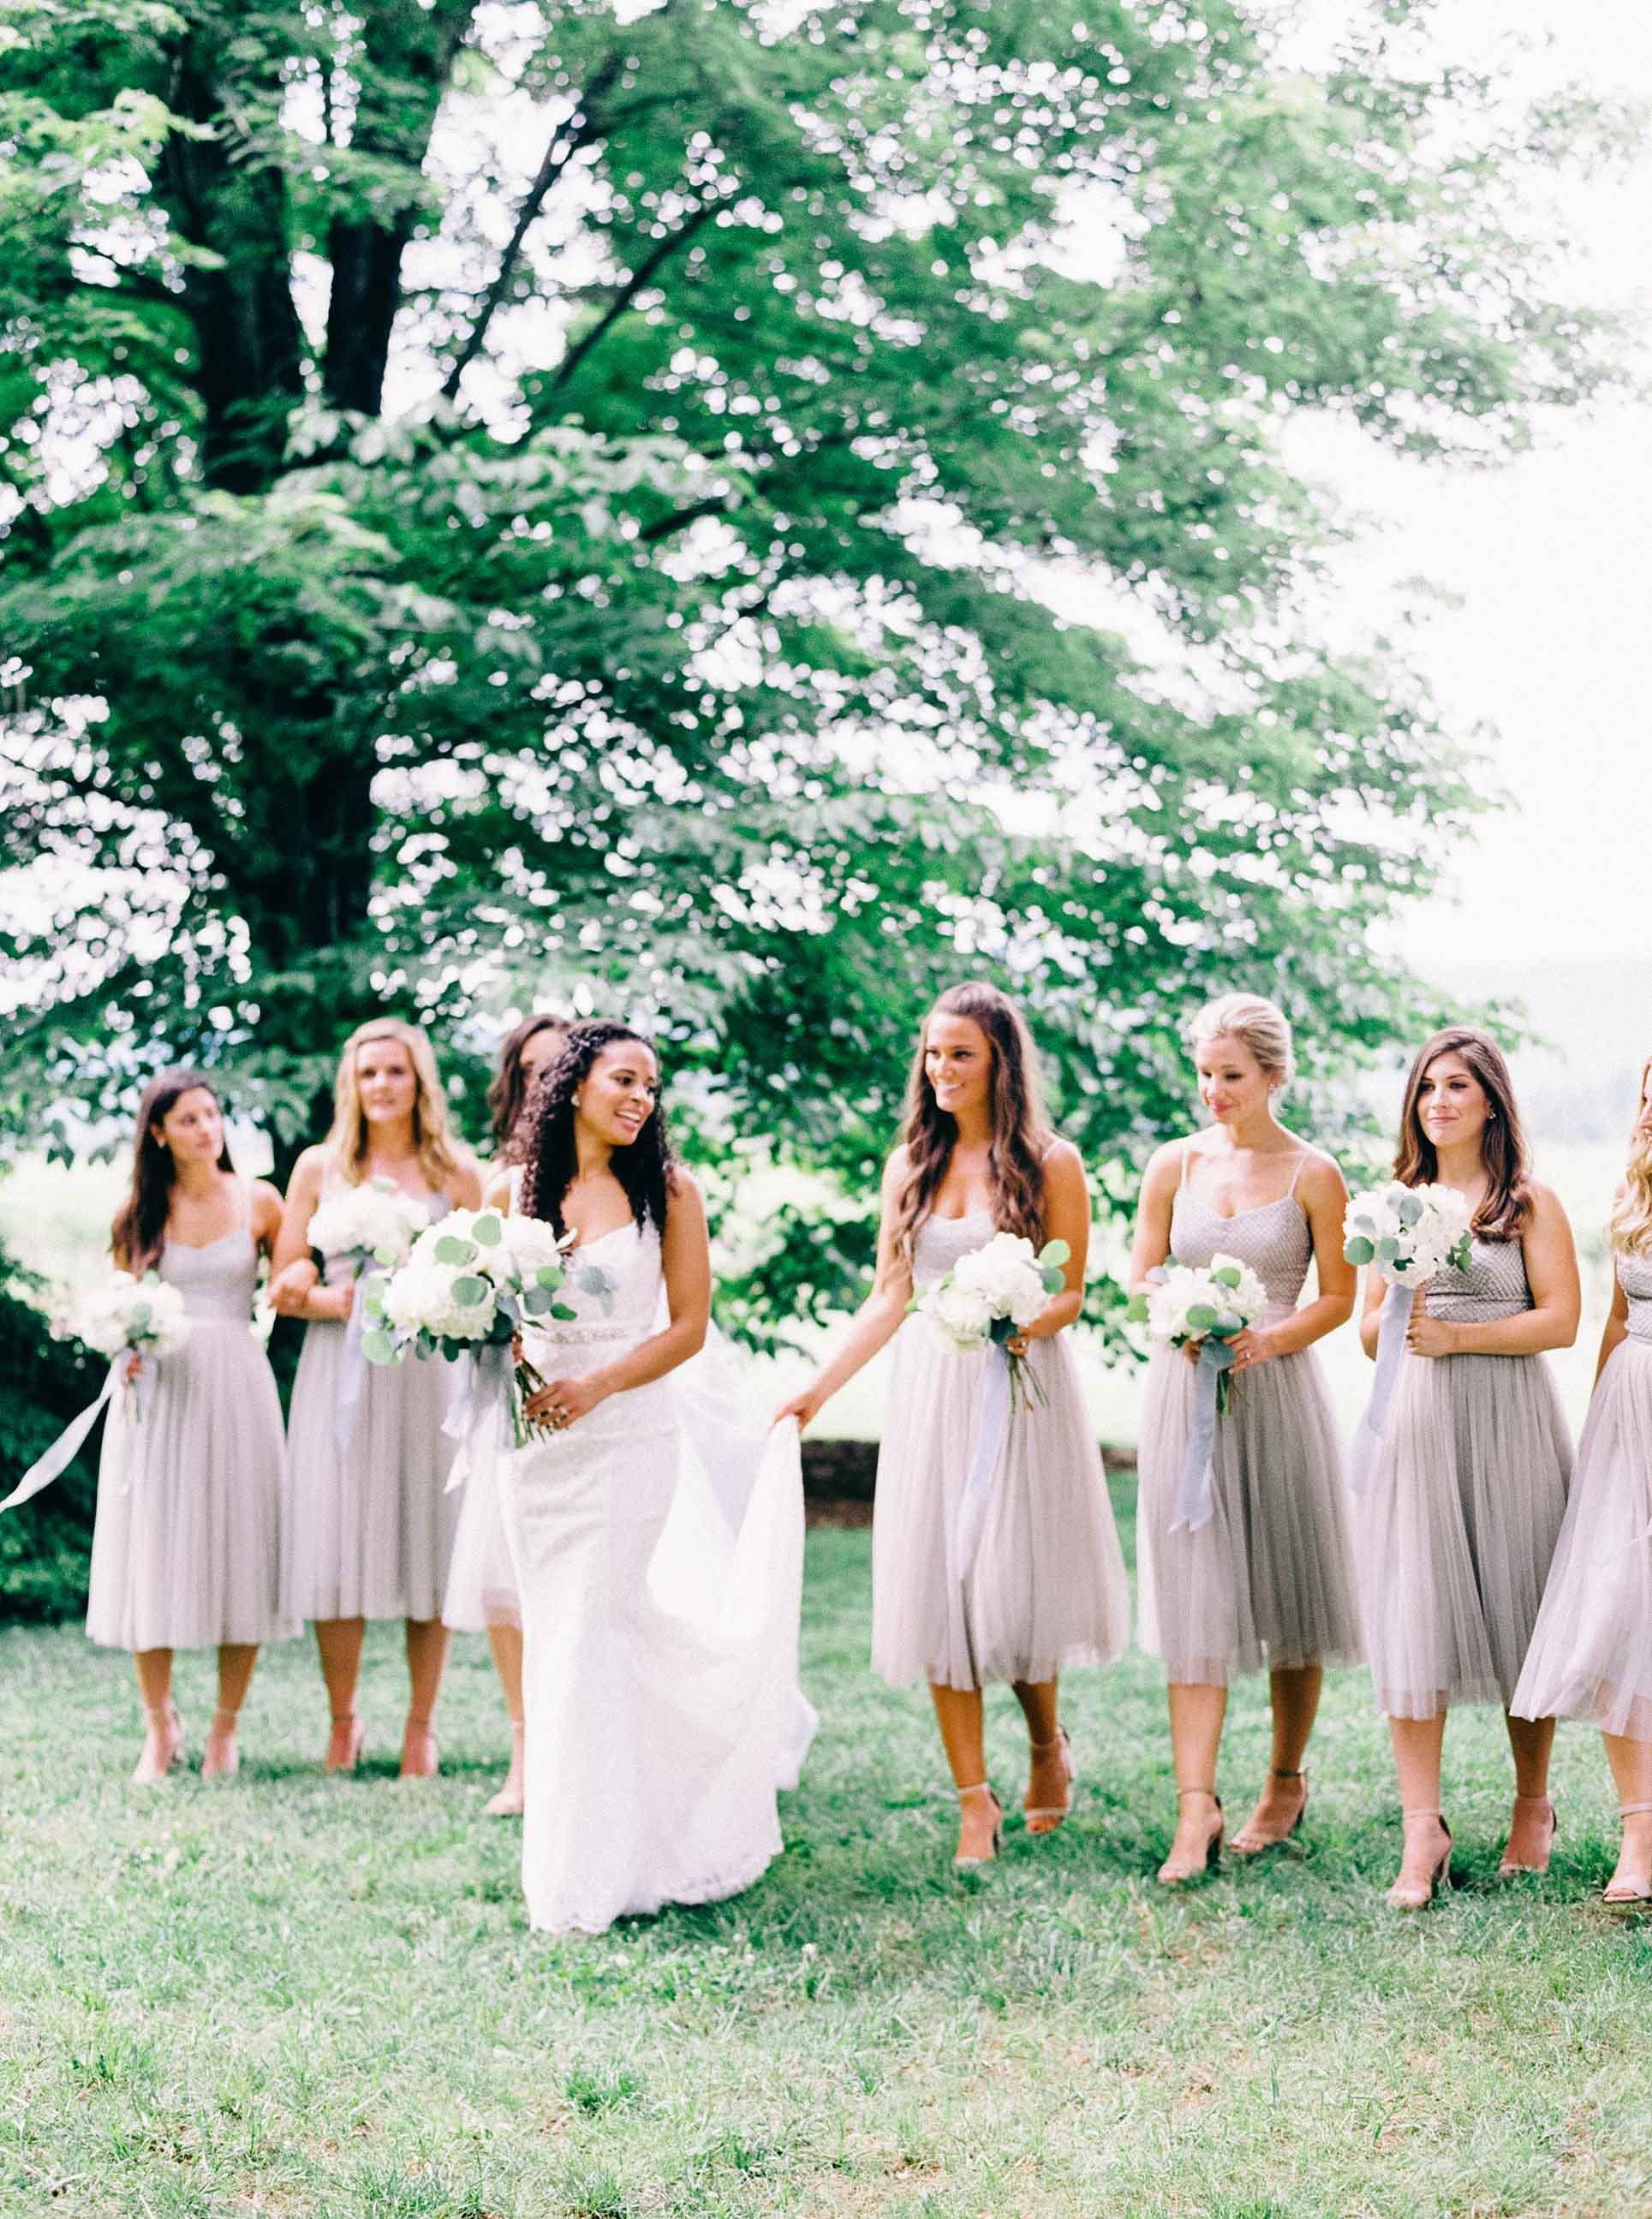 NikkiSanterre_CharlottesvilleWeddingPhotographer_KeswickVineyardWeddingonFilm_Larissa&Fern-41.jpg